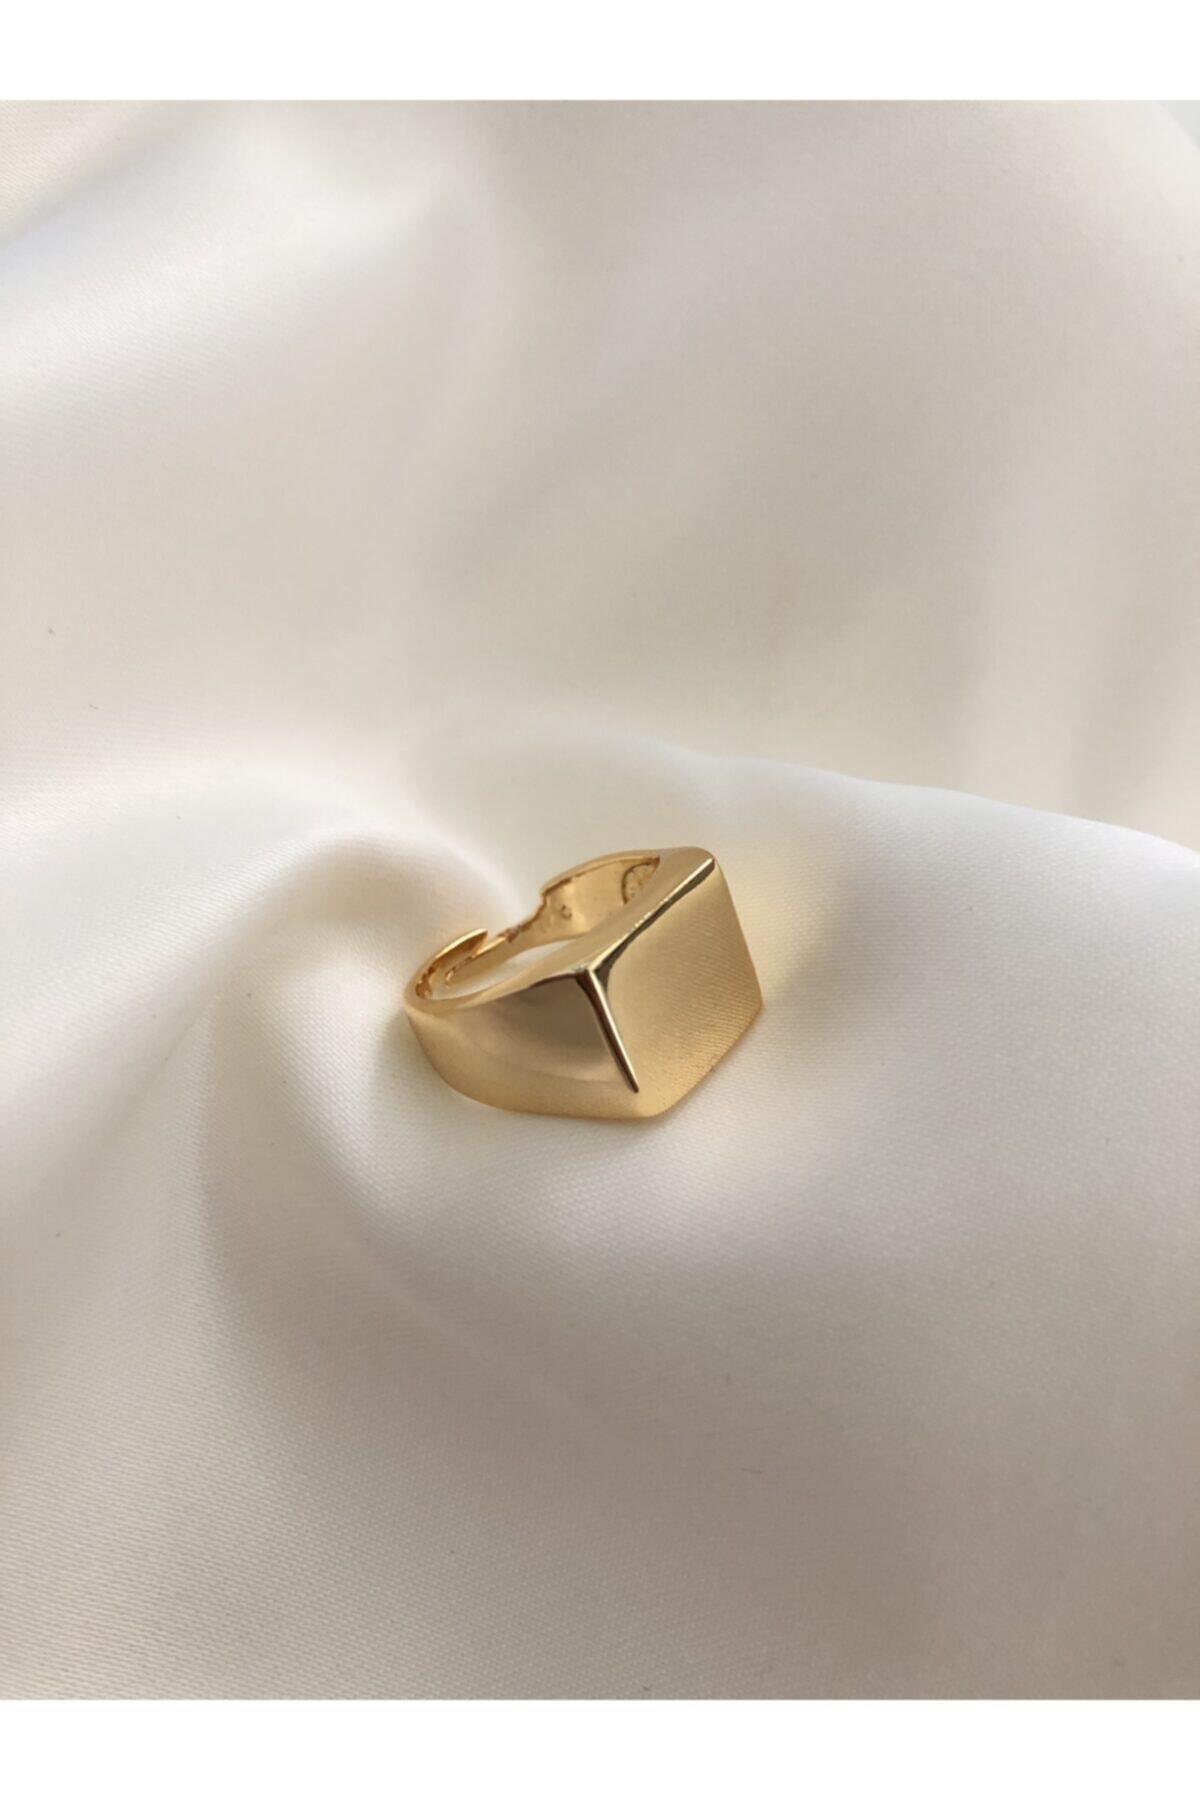 The Y Jewelry Gold Kare Şövalye Yüzük-ayarlanabilir 1